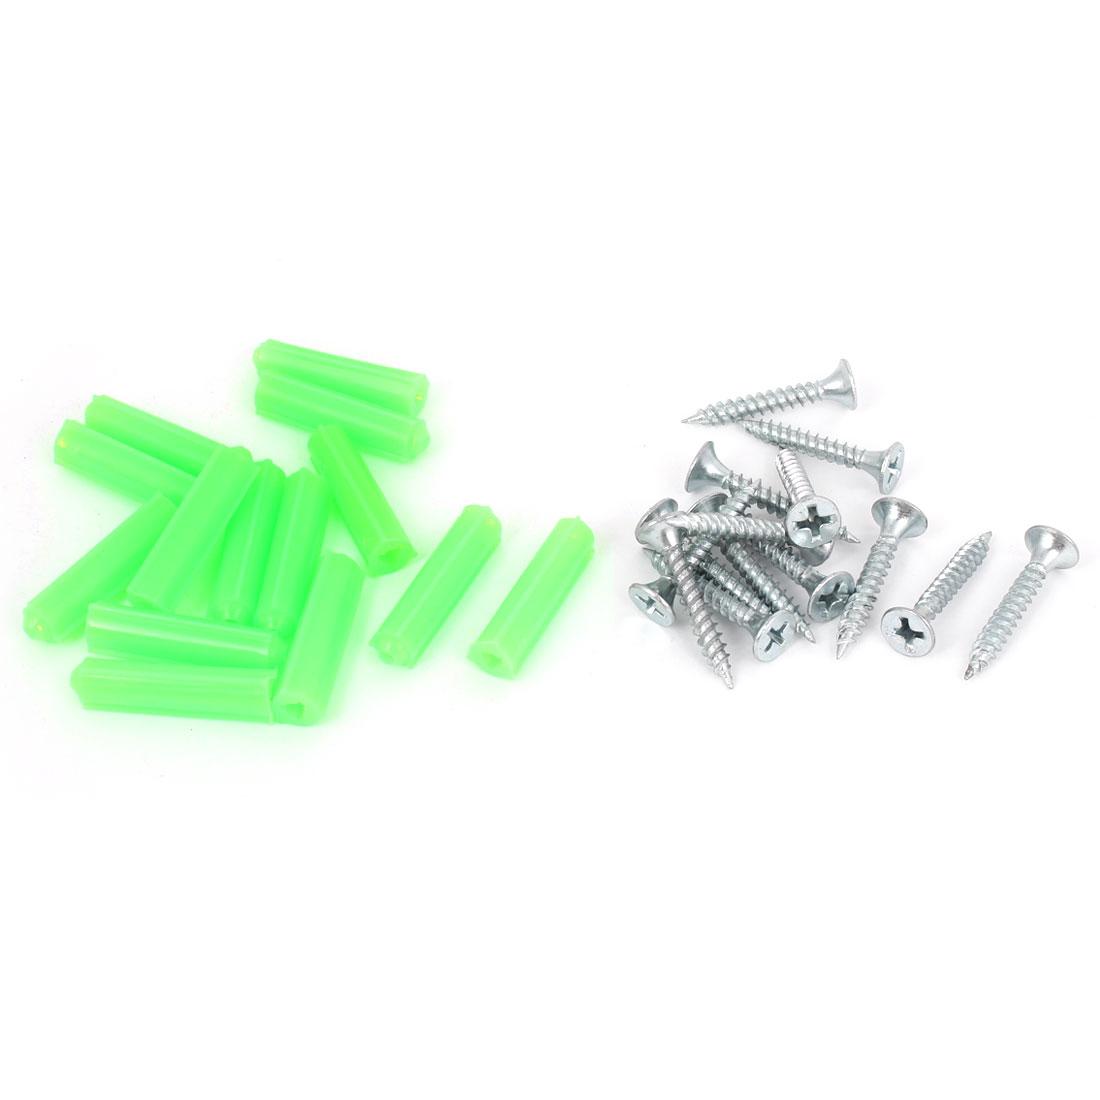 14pcs Metal Masonry Screw Silver Tone + Plastic Wall Expansion Bolt Green 27mm x 7mm